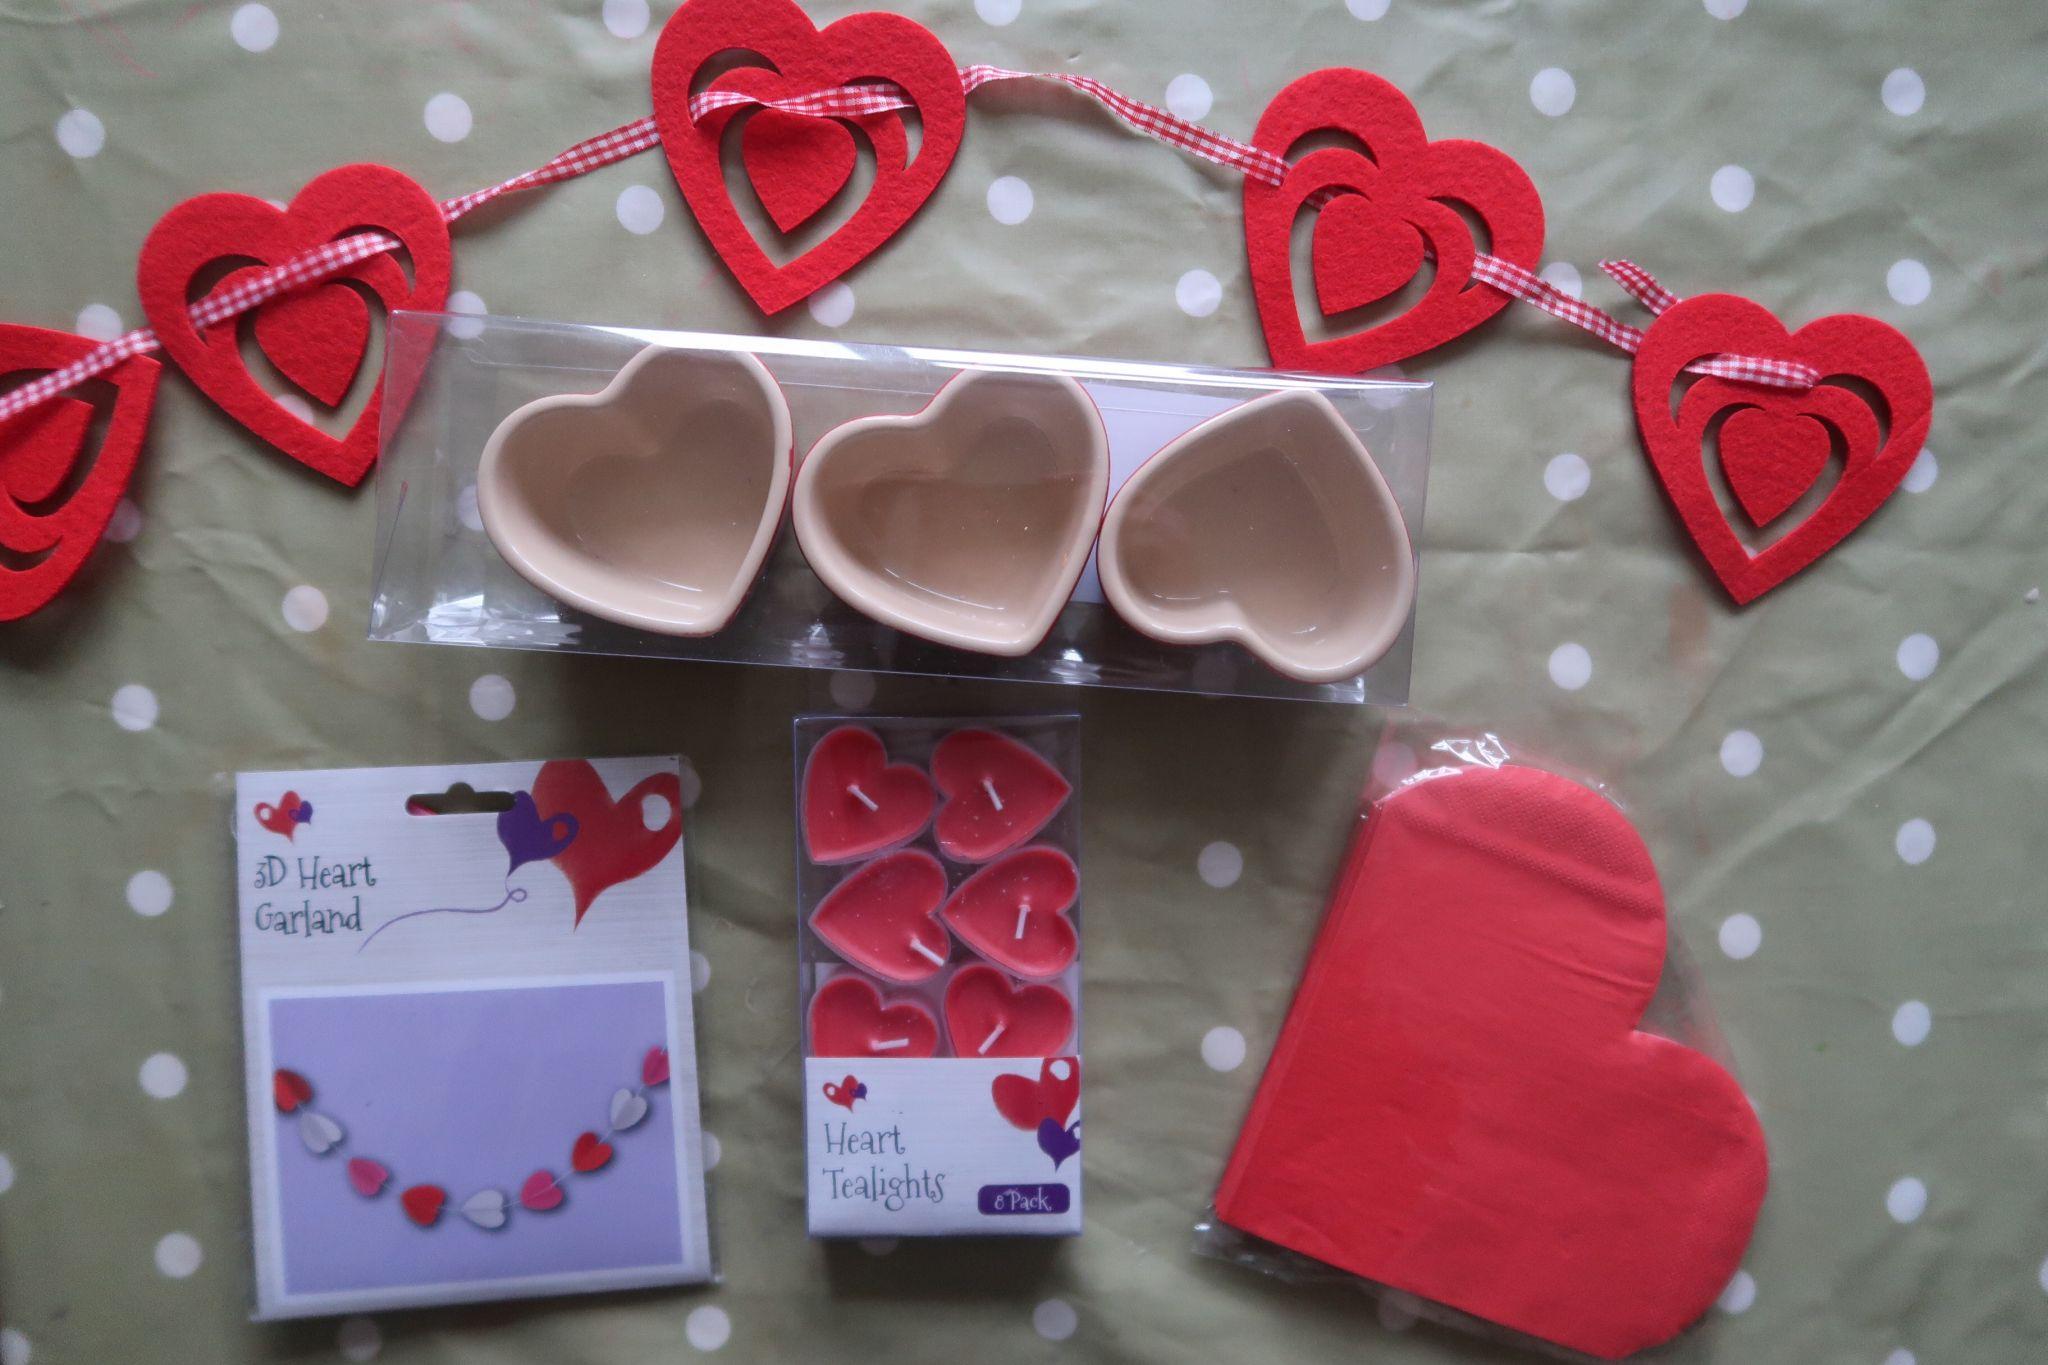 hearts bunting, heart pots, candles ad napkins